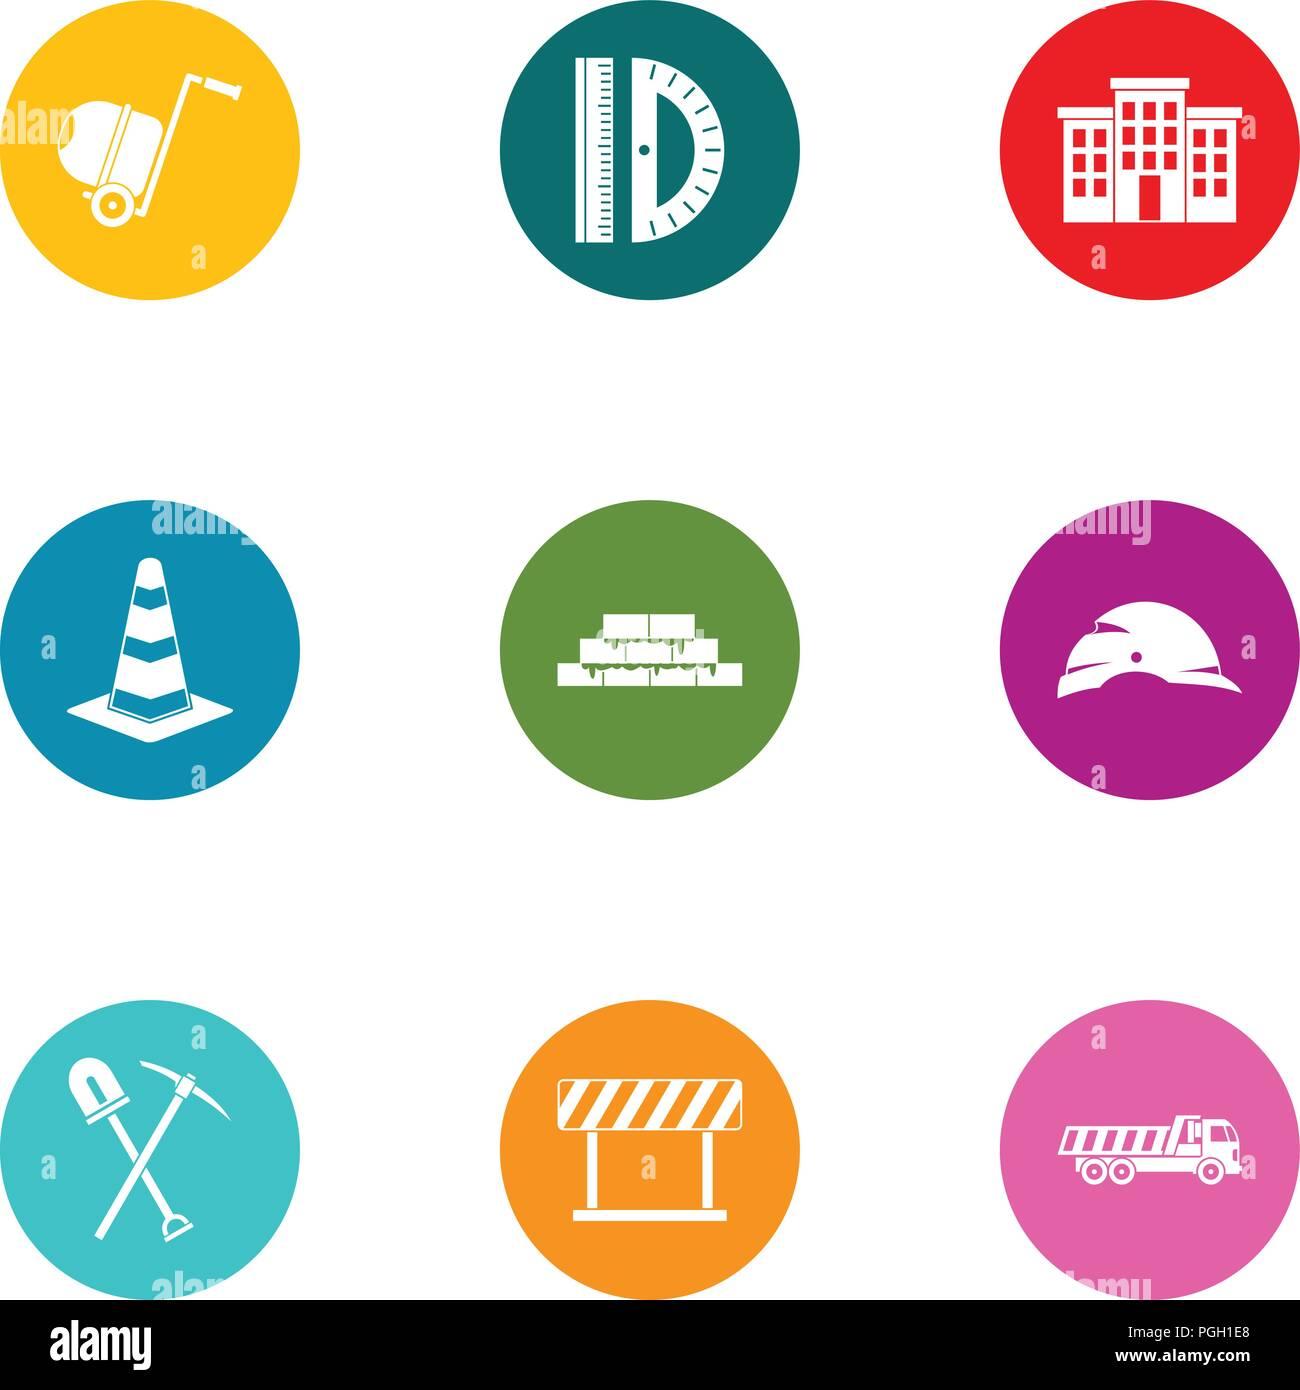 Billet icons set, flat style - Stock Image